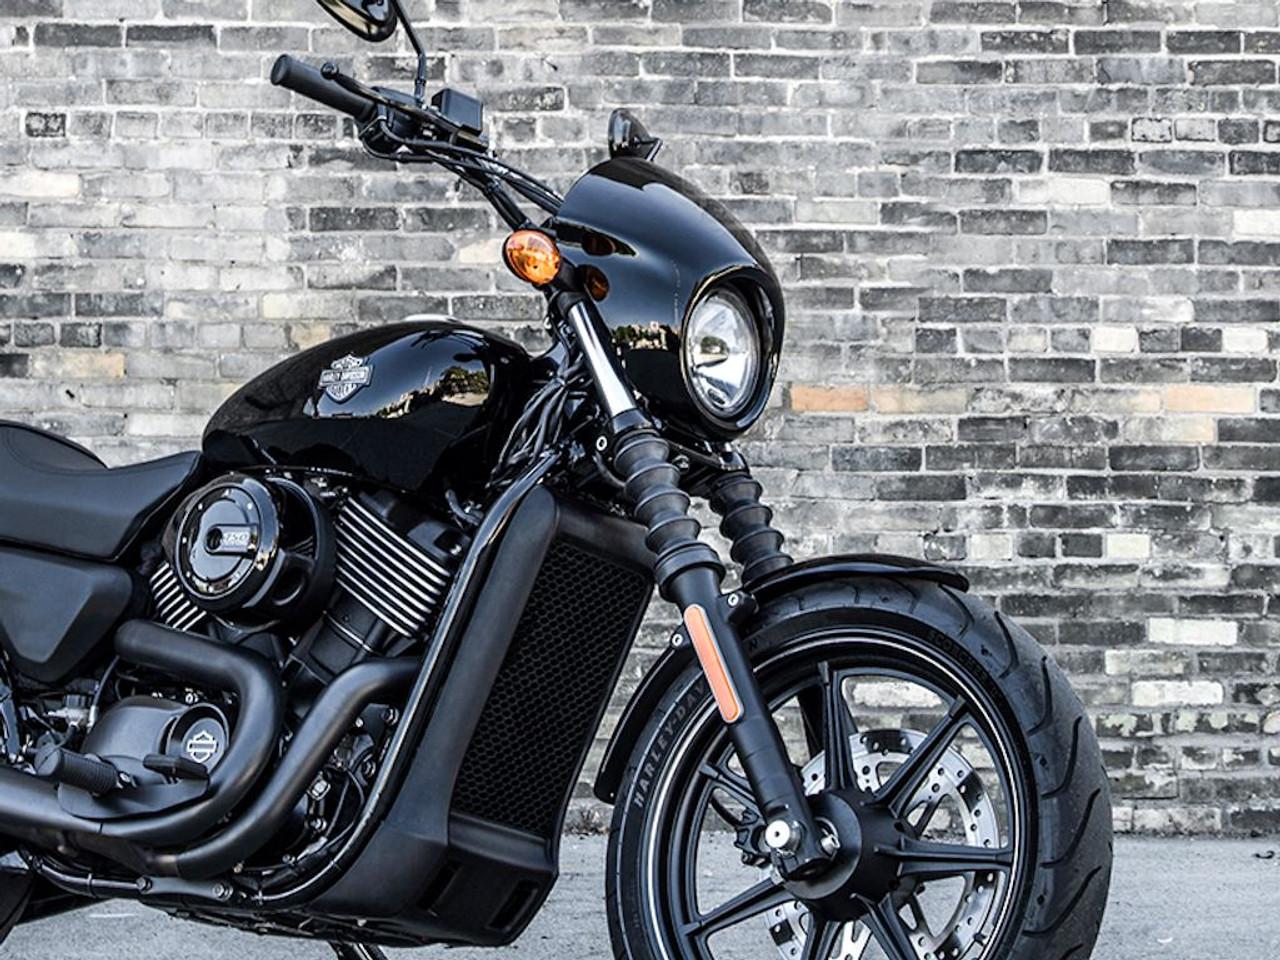 Headlight Fairing Cowling For Harley Davidson Street Xg